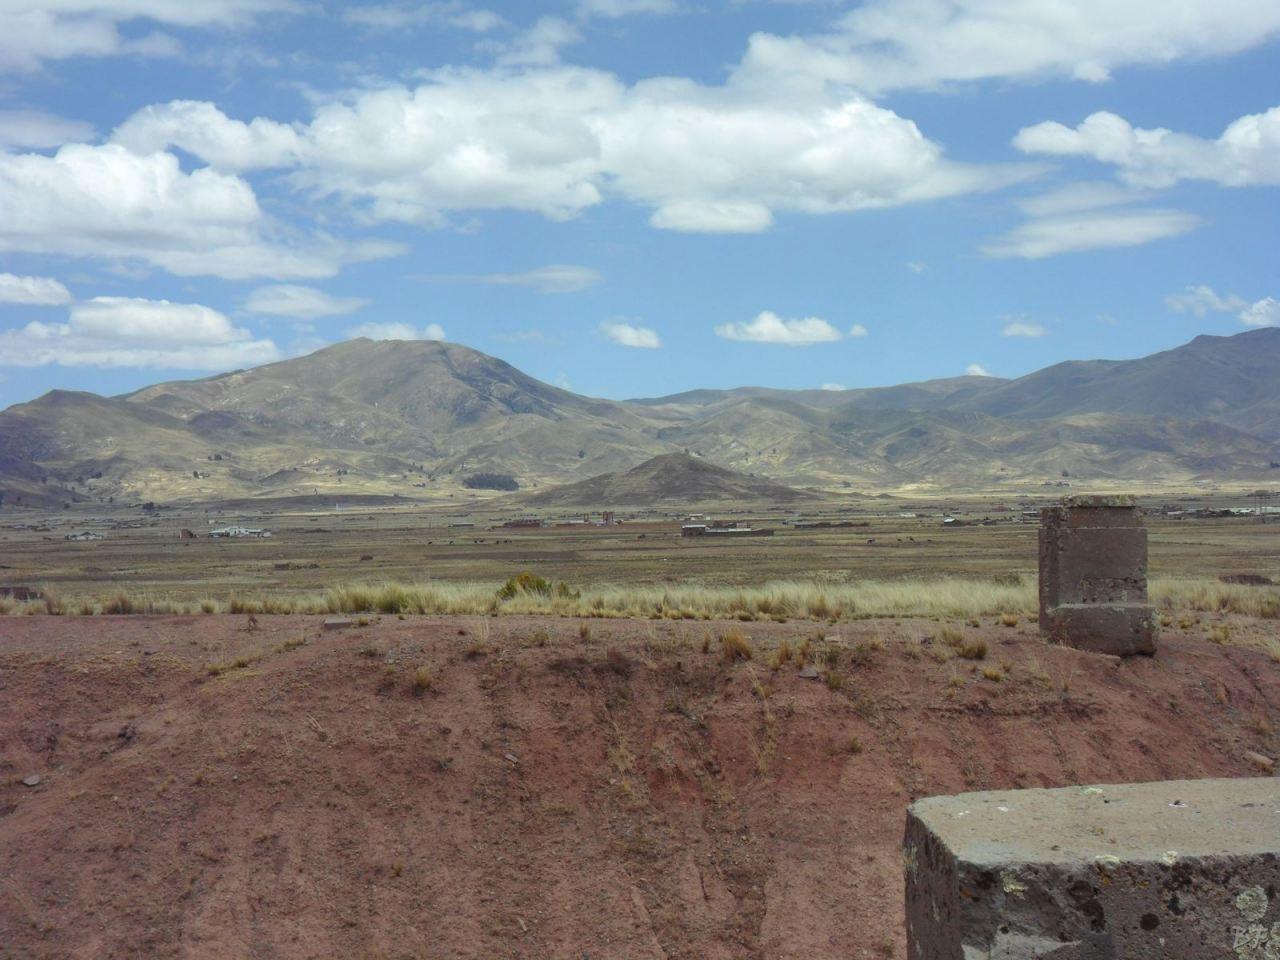 Sito-Megalitico-Piramide-Akapana-Kalasasaya-Menhir-Tiahuanaco-Bolivia-117